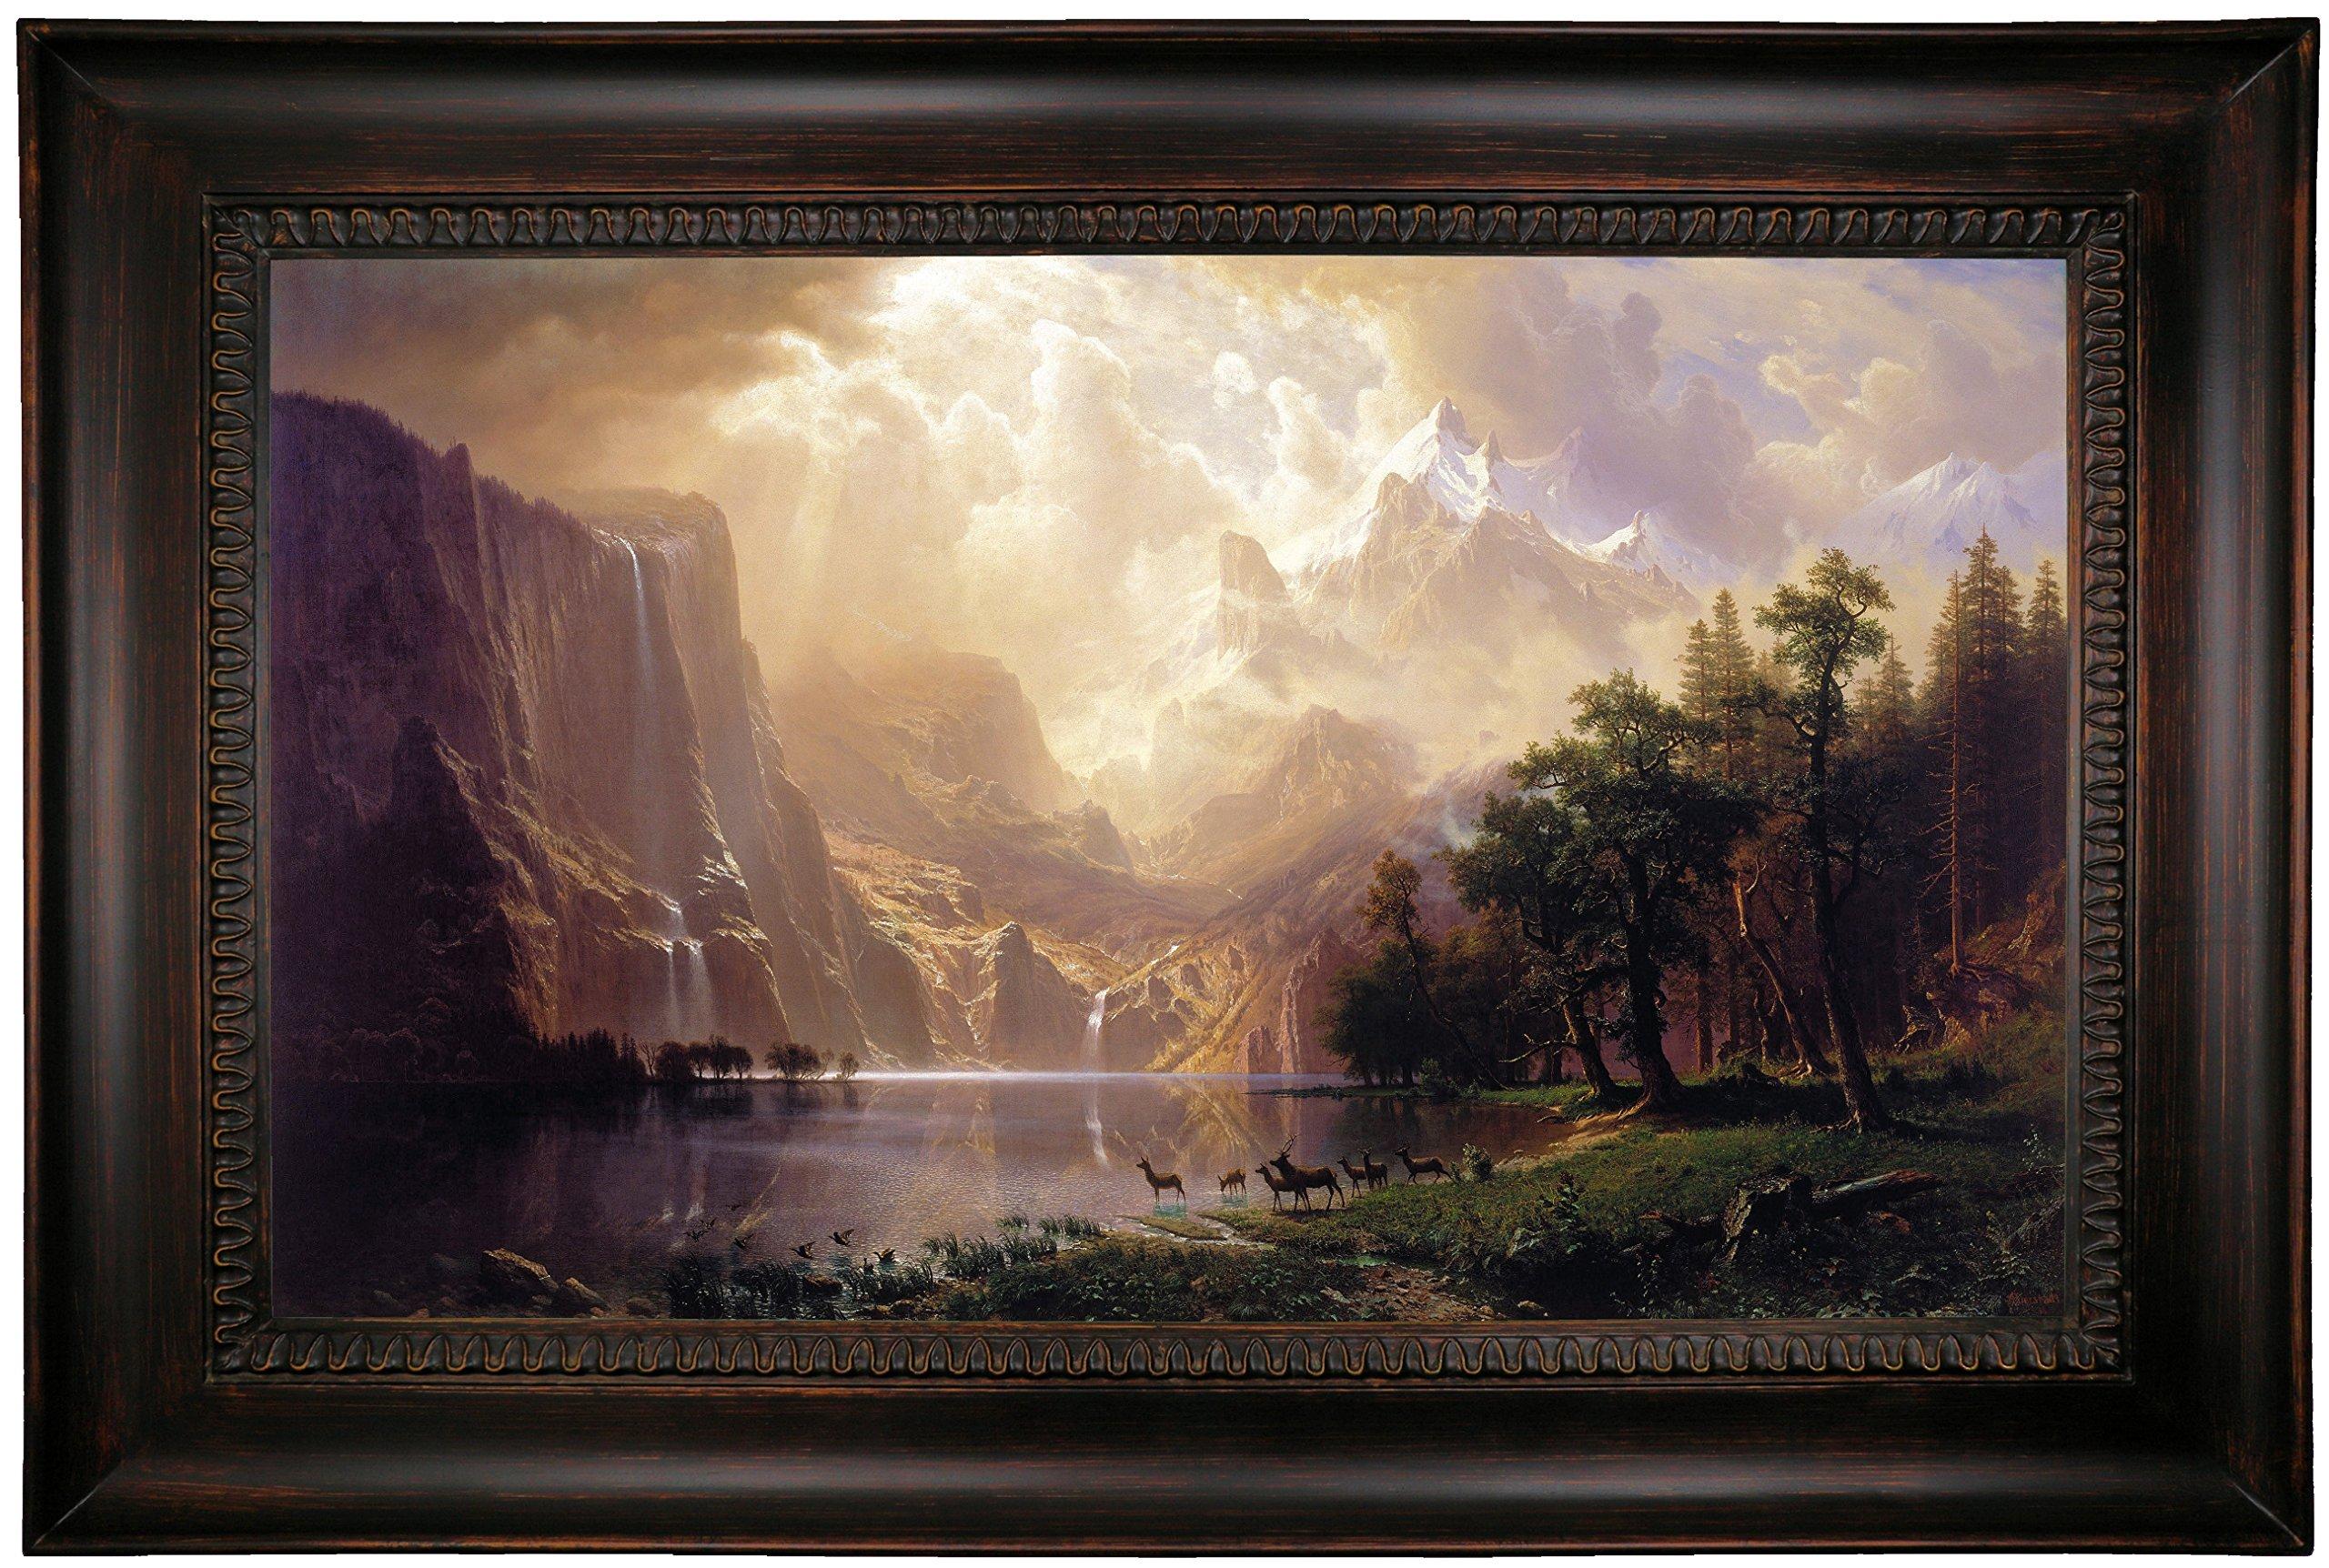 Historic Art Gallery Among the Sierra Nevada, California 1868 by Albert Bierstadt Framed Canvas Print, 19'' x 32'', Dark Gold Gallery by Historic Art Gallery